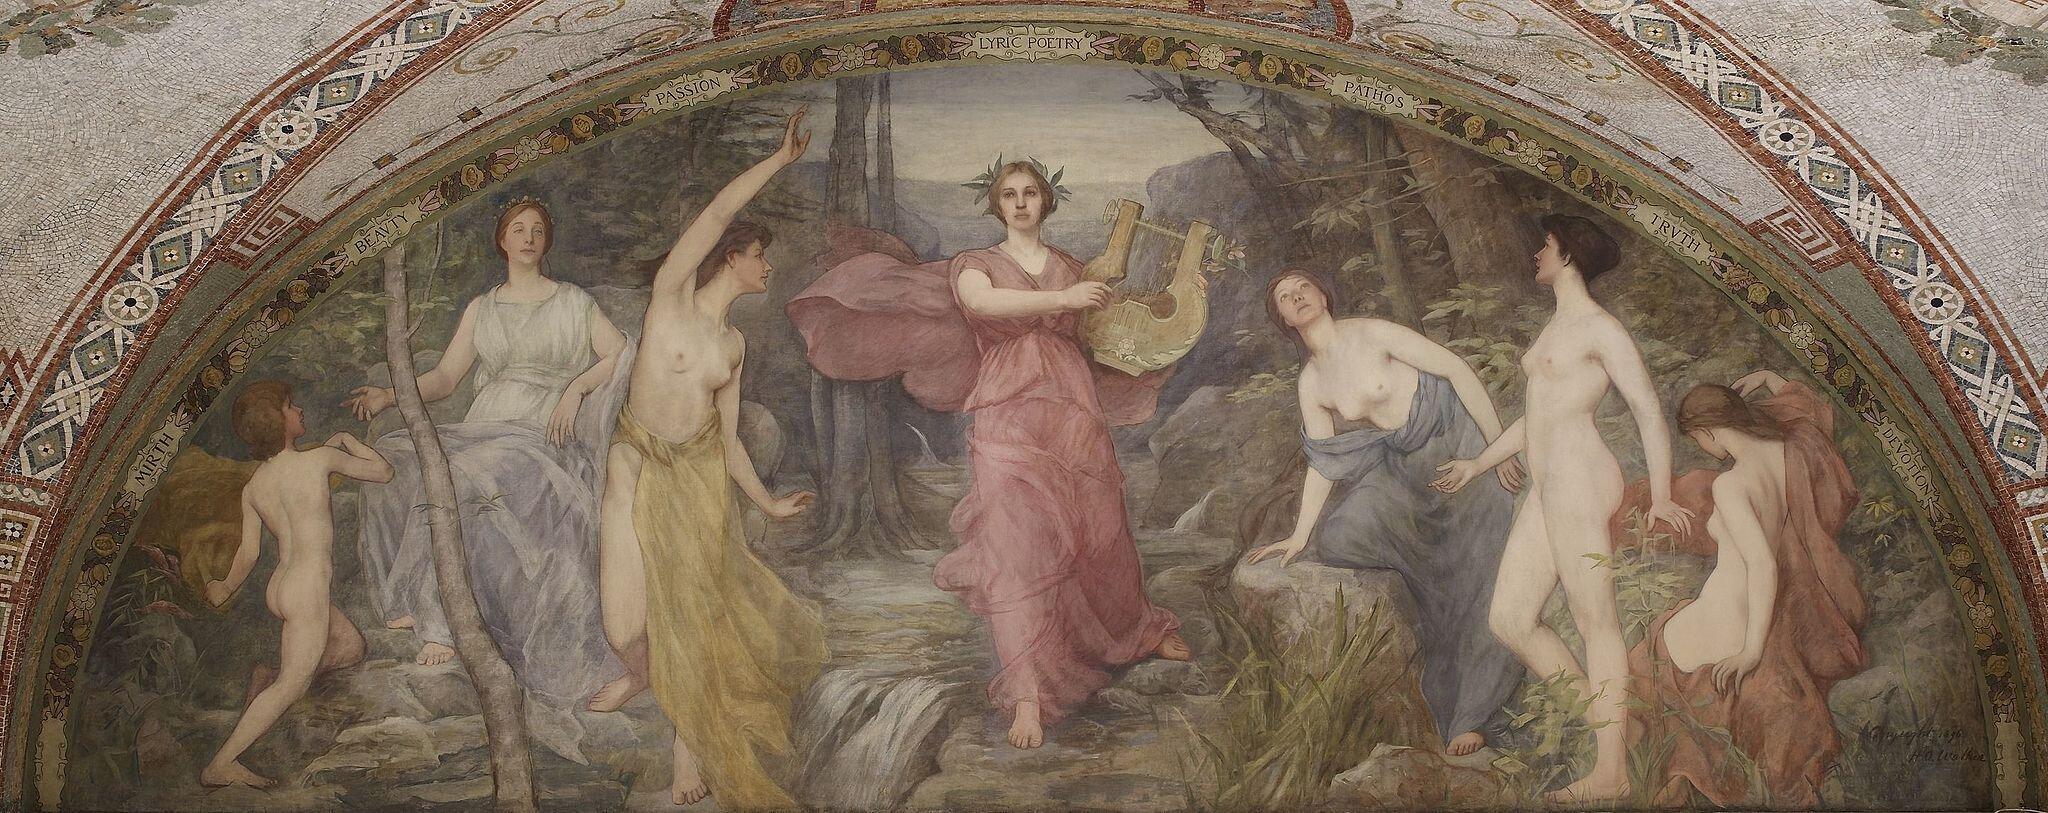 Grecka Lira Safona Tyrtajos Symonides I Anakreont